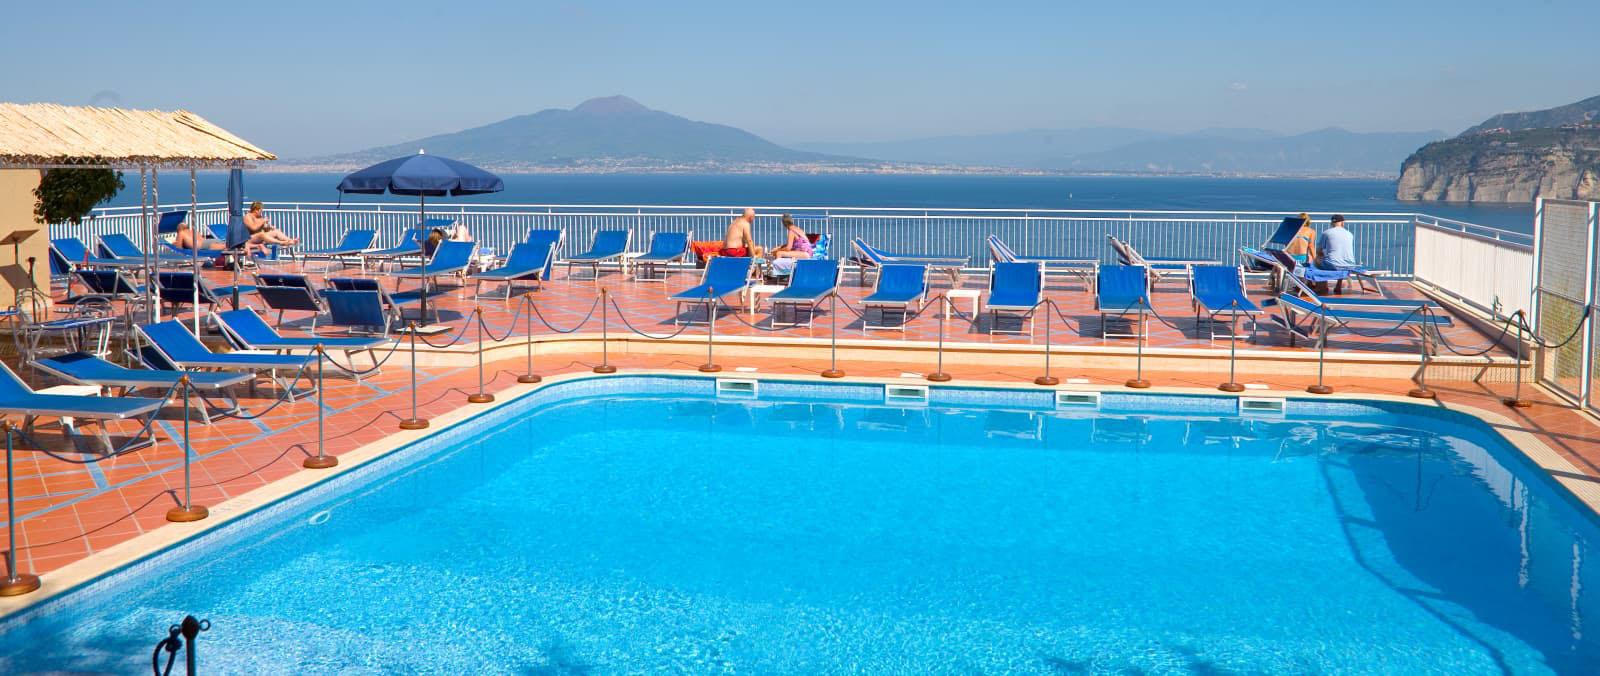 Hotel Minerva - Sorrento